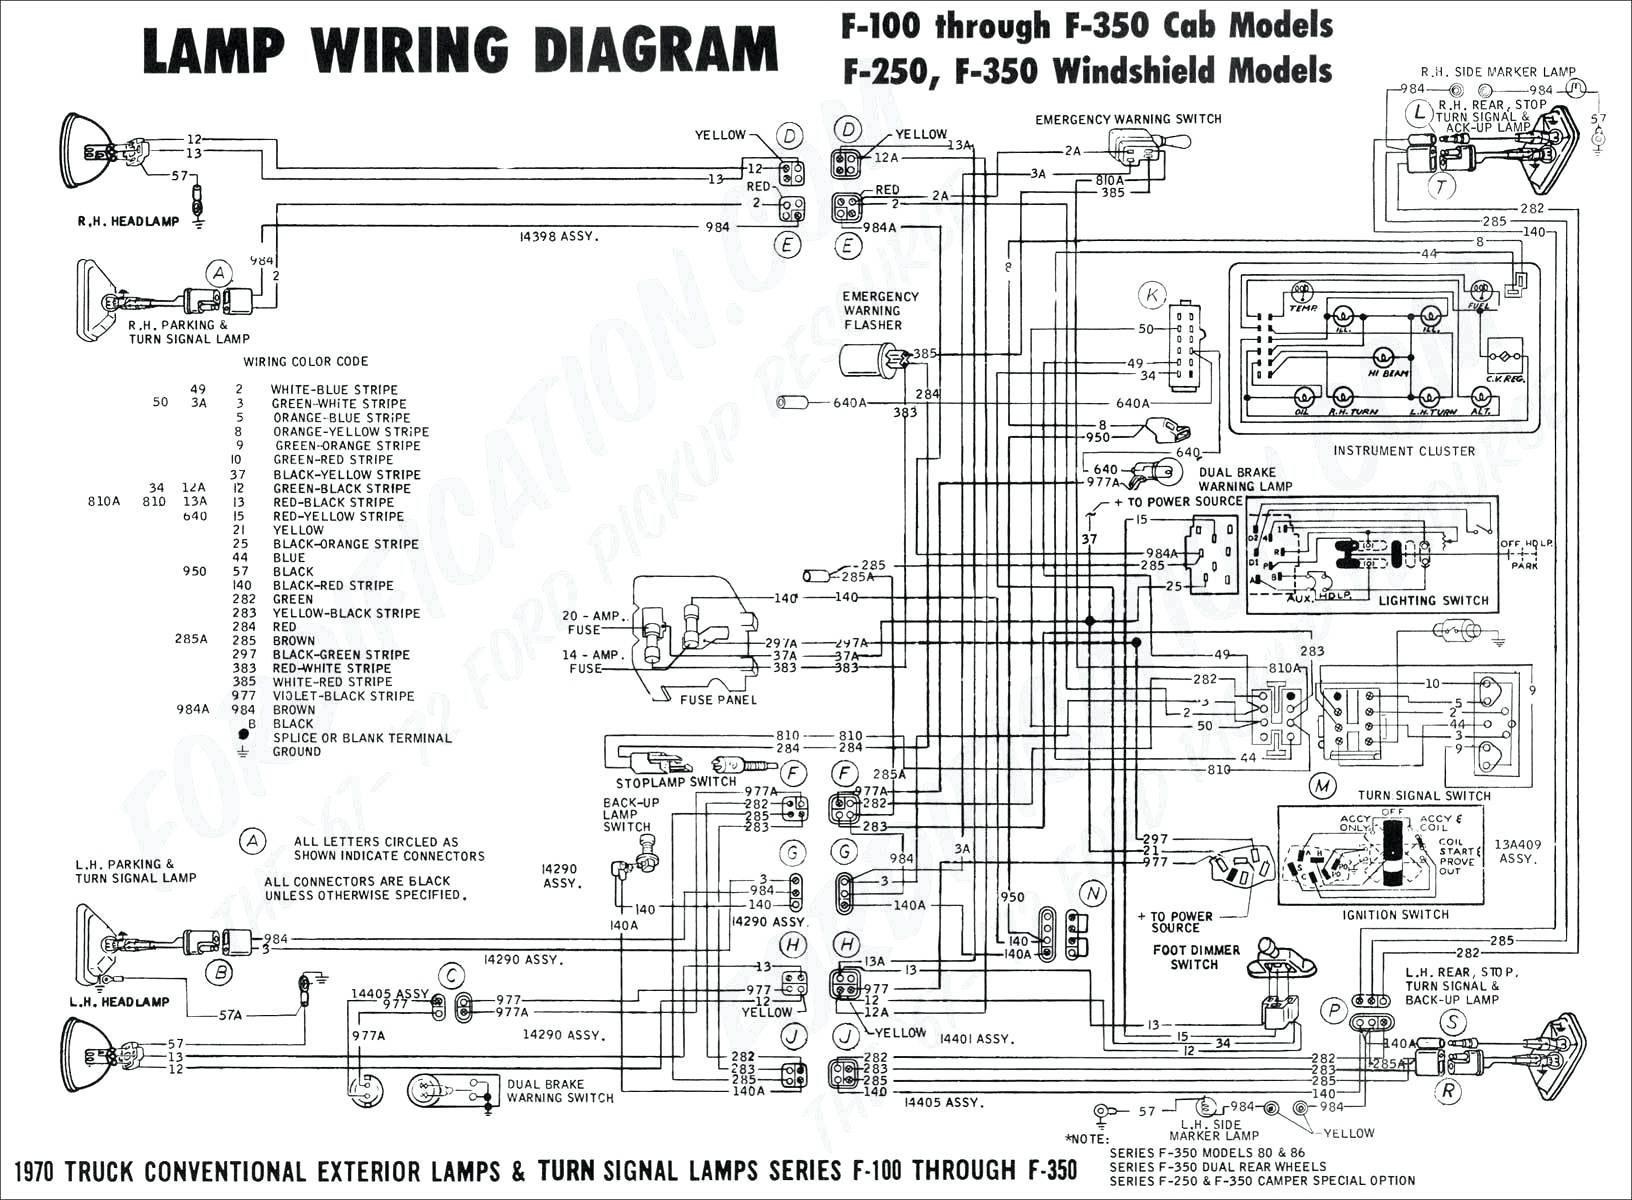 Semi Air Brake System Diagram Abs Test Diagrams Of Semi Air Brake System Diagram